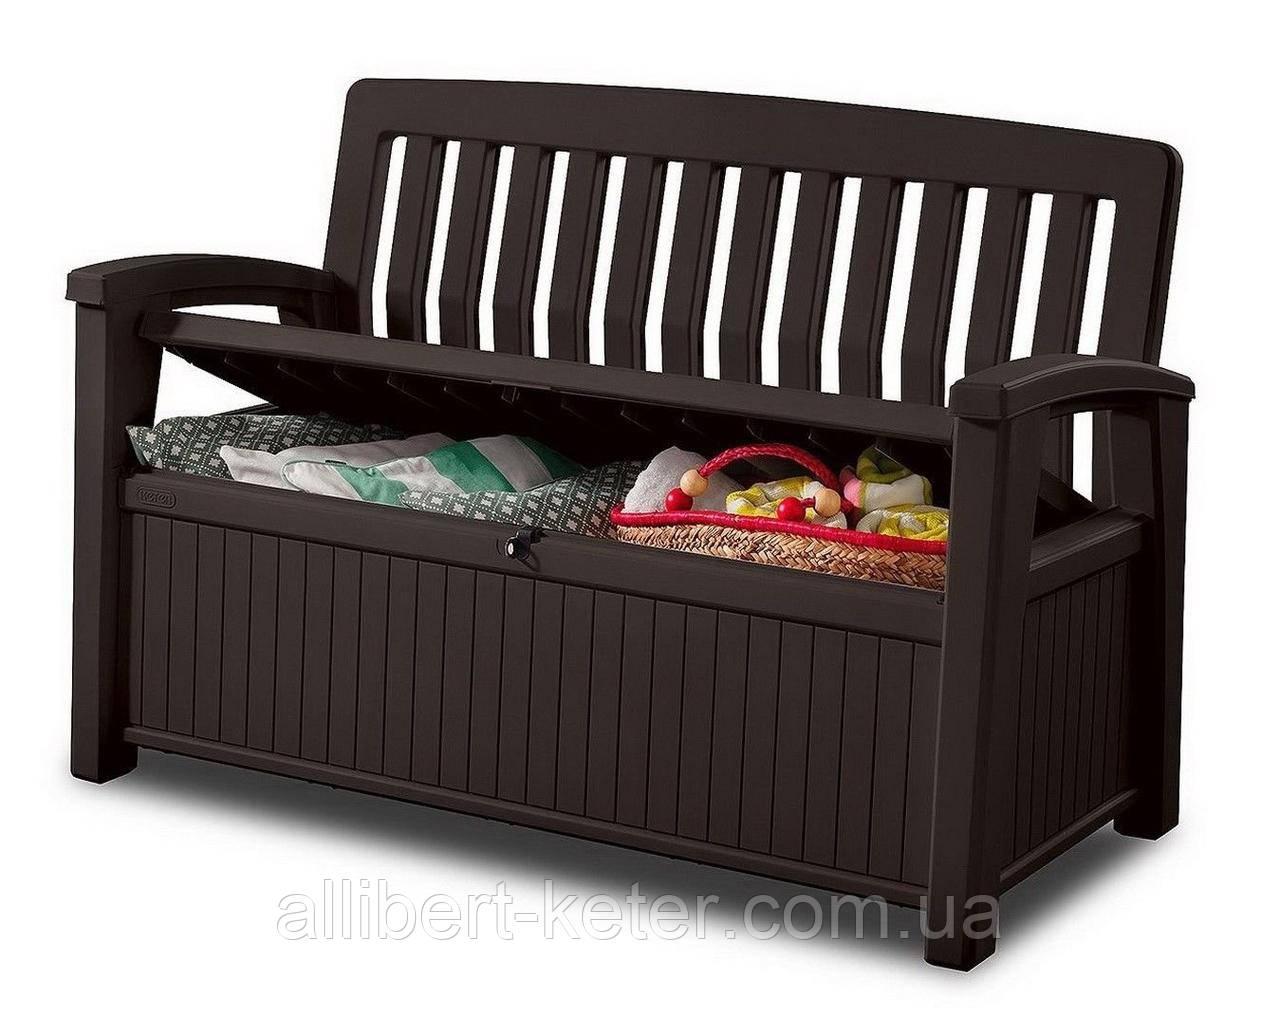 Скамья-сундук Keter Patio Storage Bench 227 L